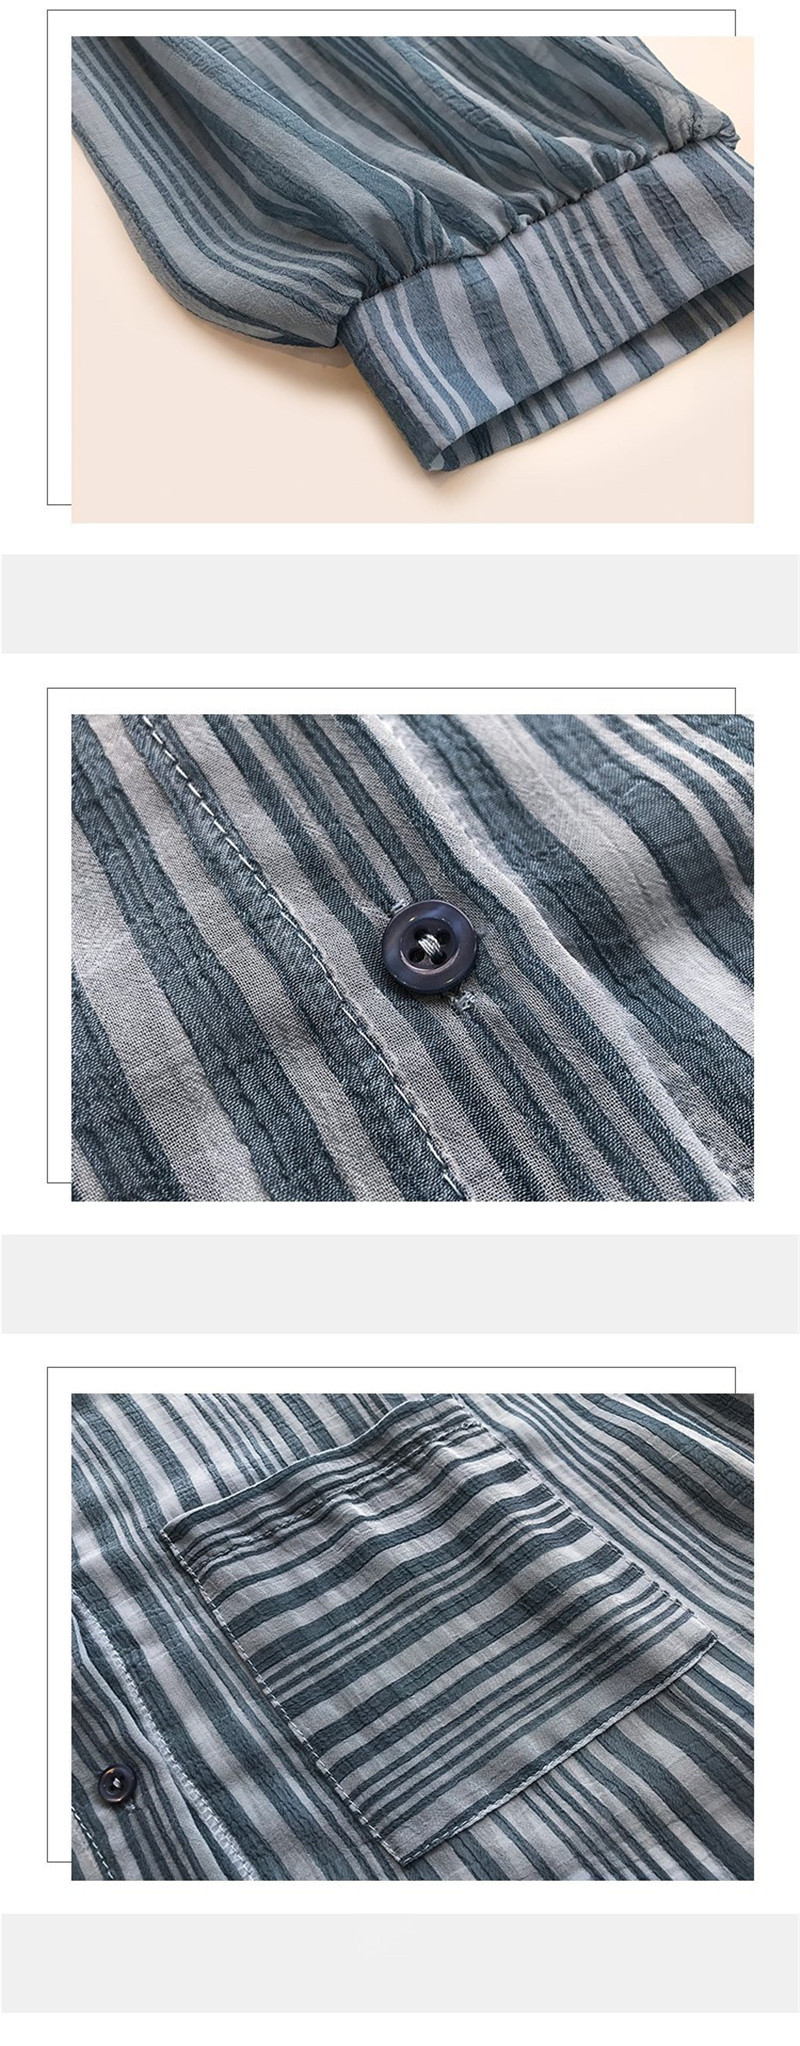 Summer Tops For Women 2019 Loose Lantern Sleeves Striped Shirt Female Chiffon Cardigan Wild Sun Protection Clothings (13)